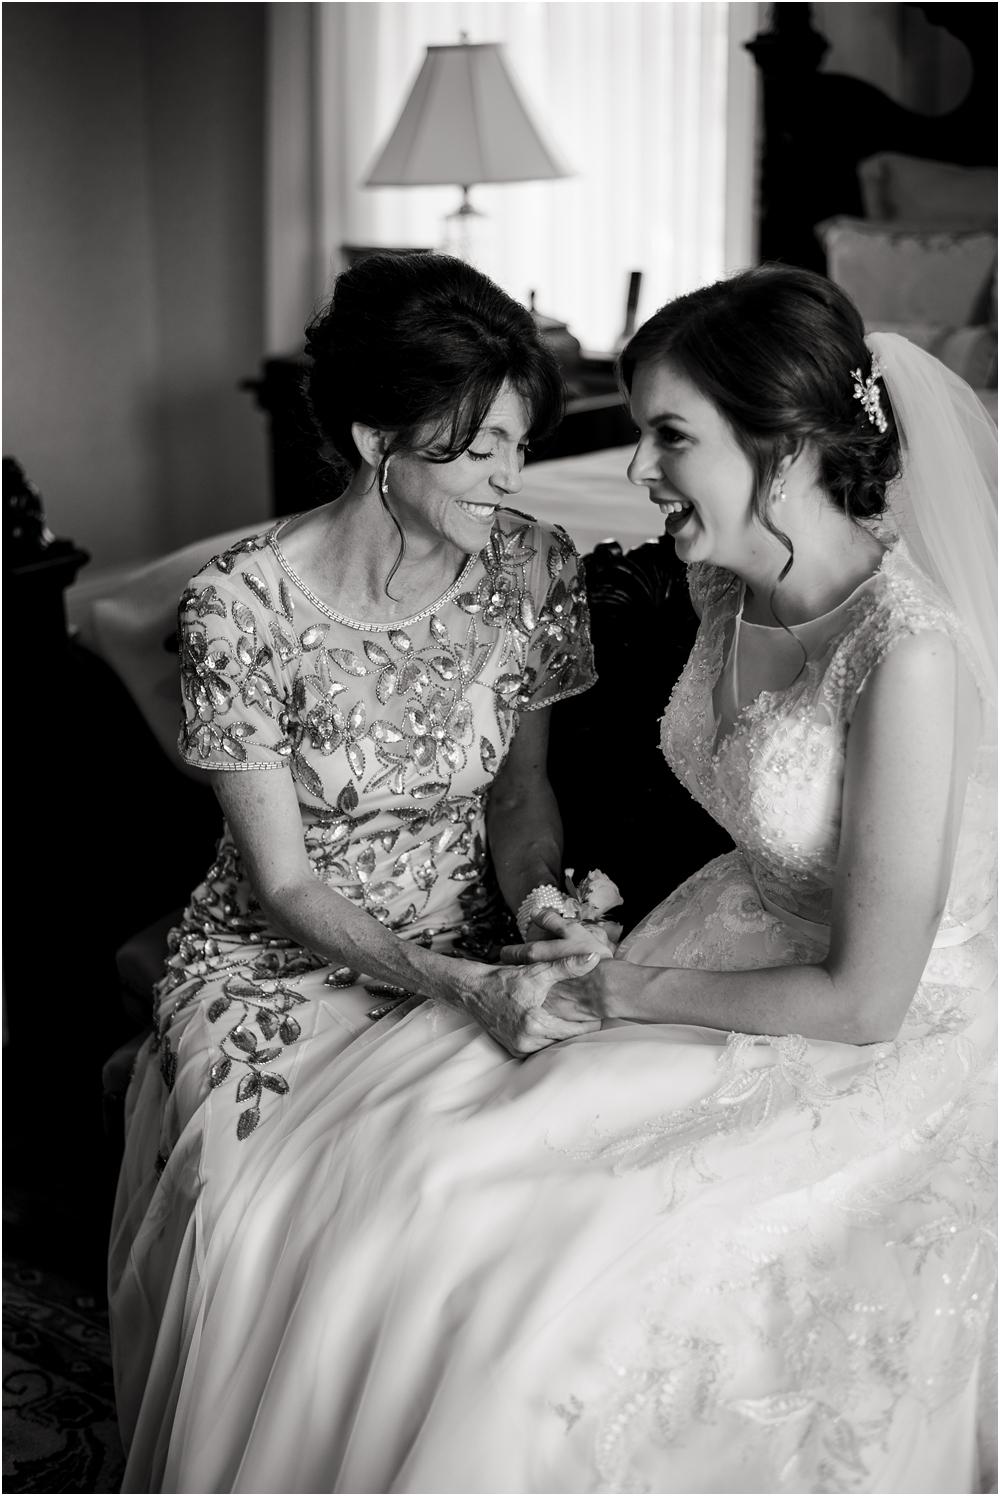 marianna-florida-wedding-photographer-kiersten-grant-108.jpg